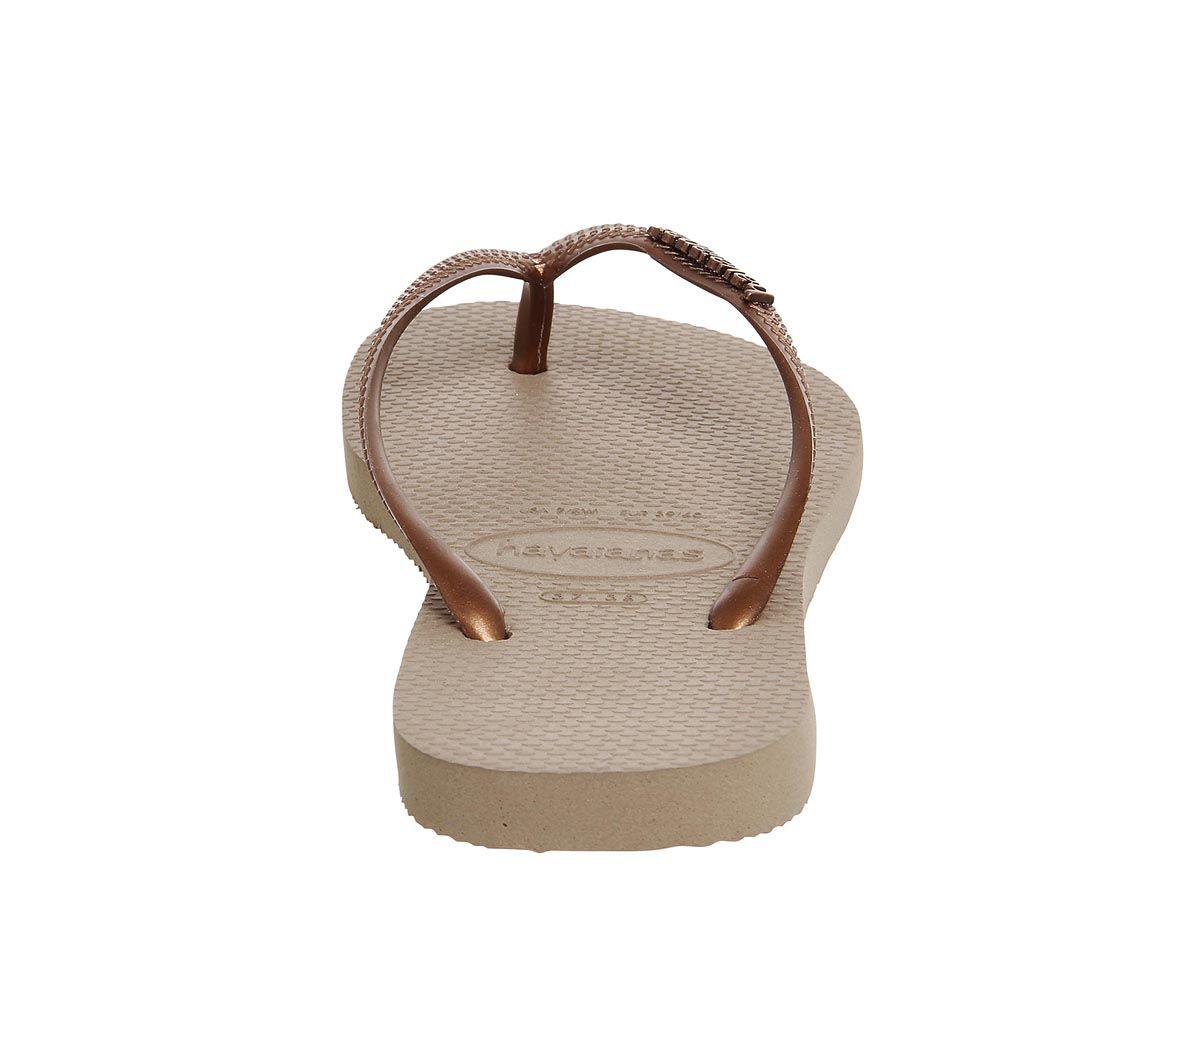 84e7d6356e76 Havaianas Slim Logo Metallic Flip Flops Copper - Sandals